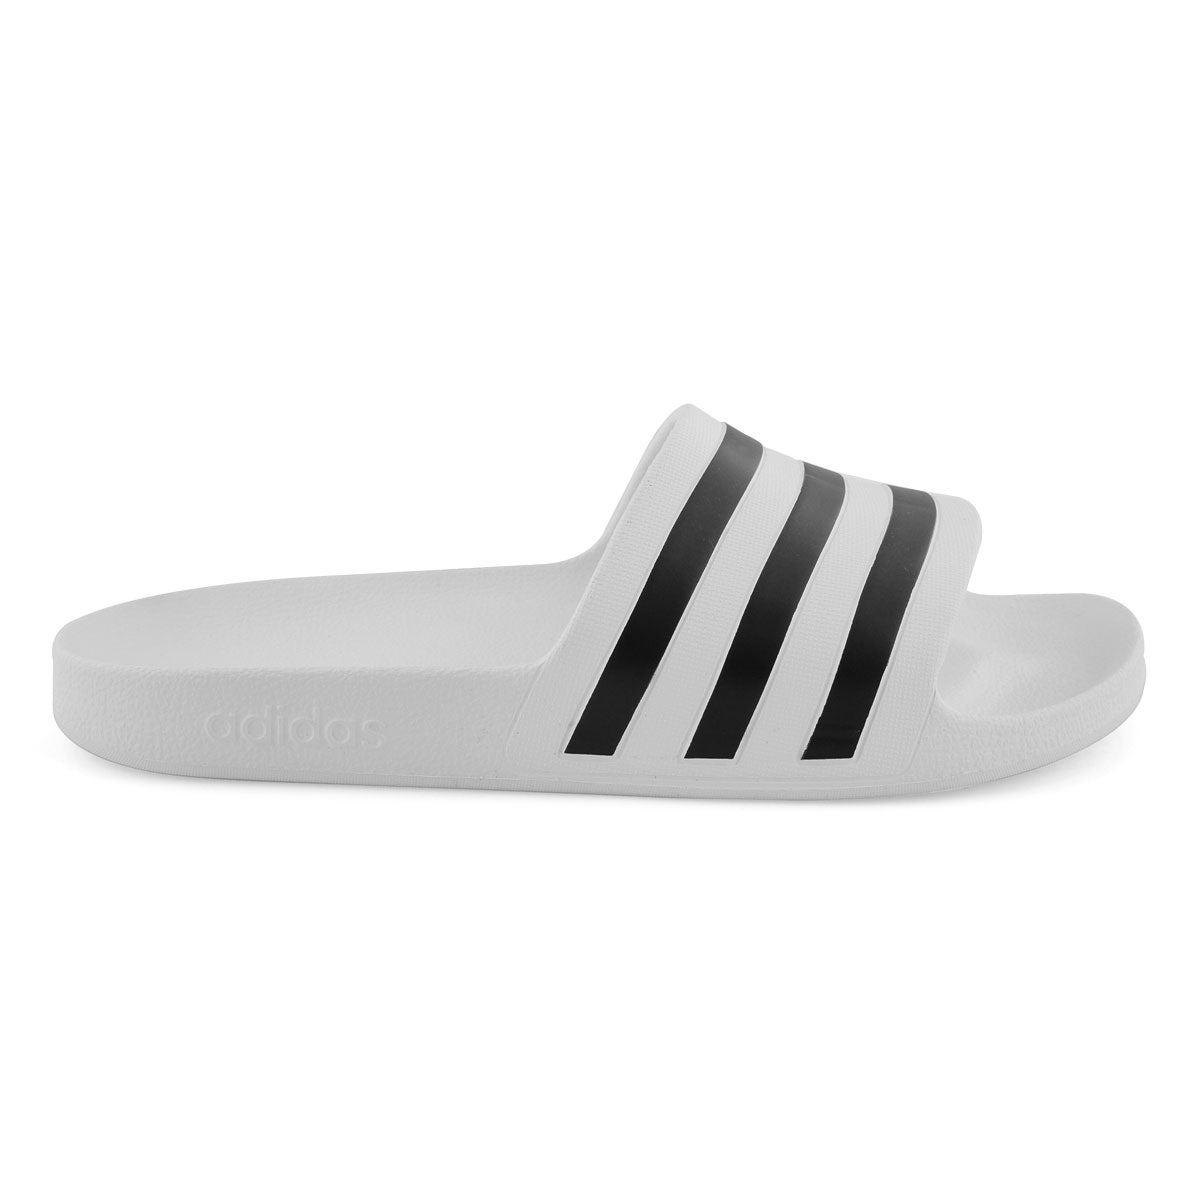 adidas Adilette Aqua Women's Slides Slippers, WhiteBlack at